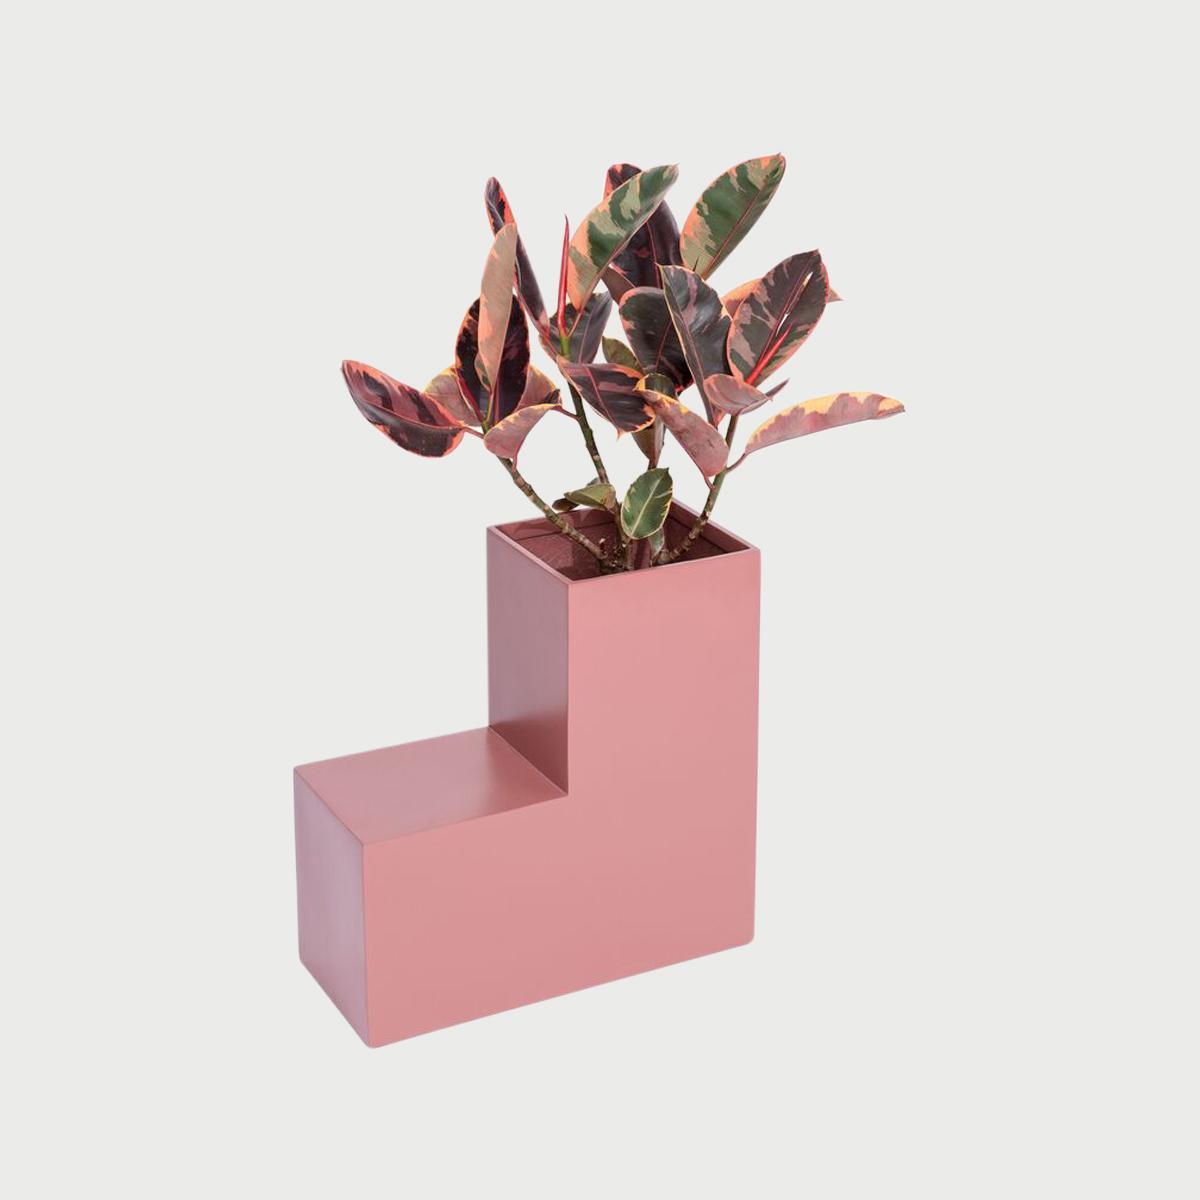 Tetrisplanter